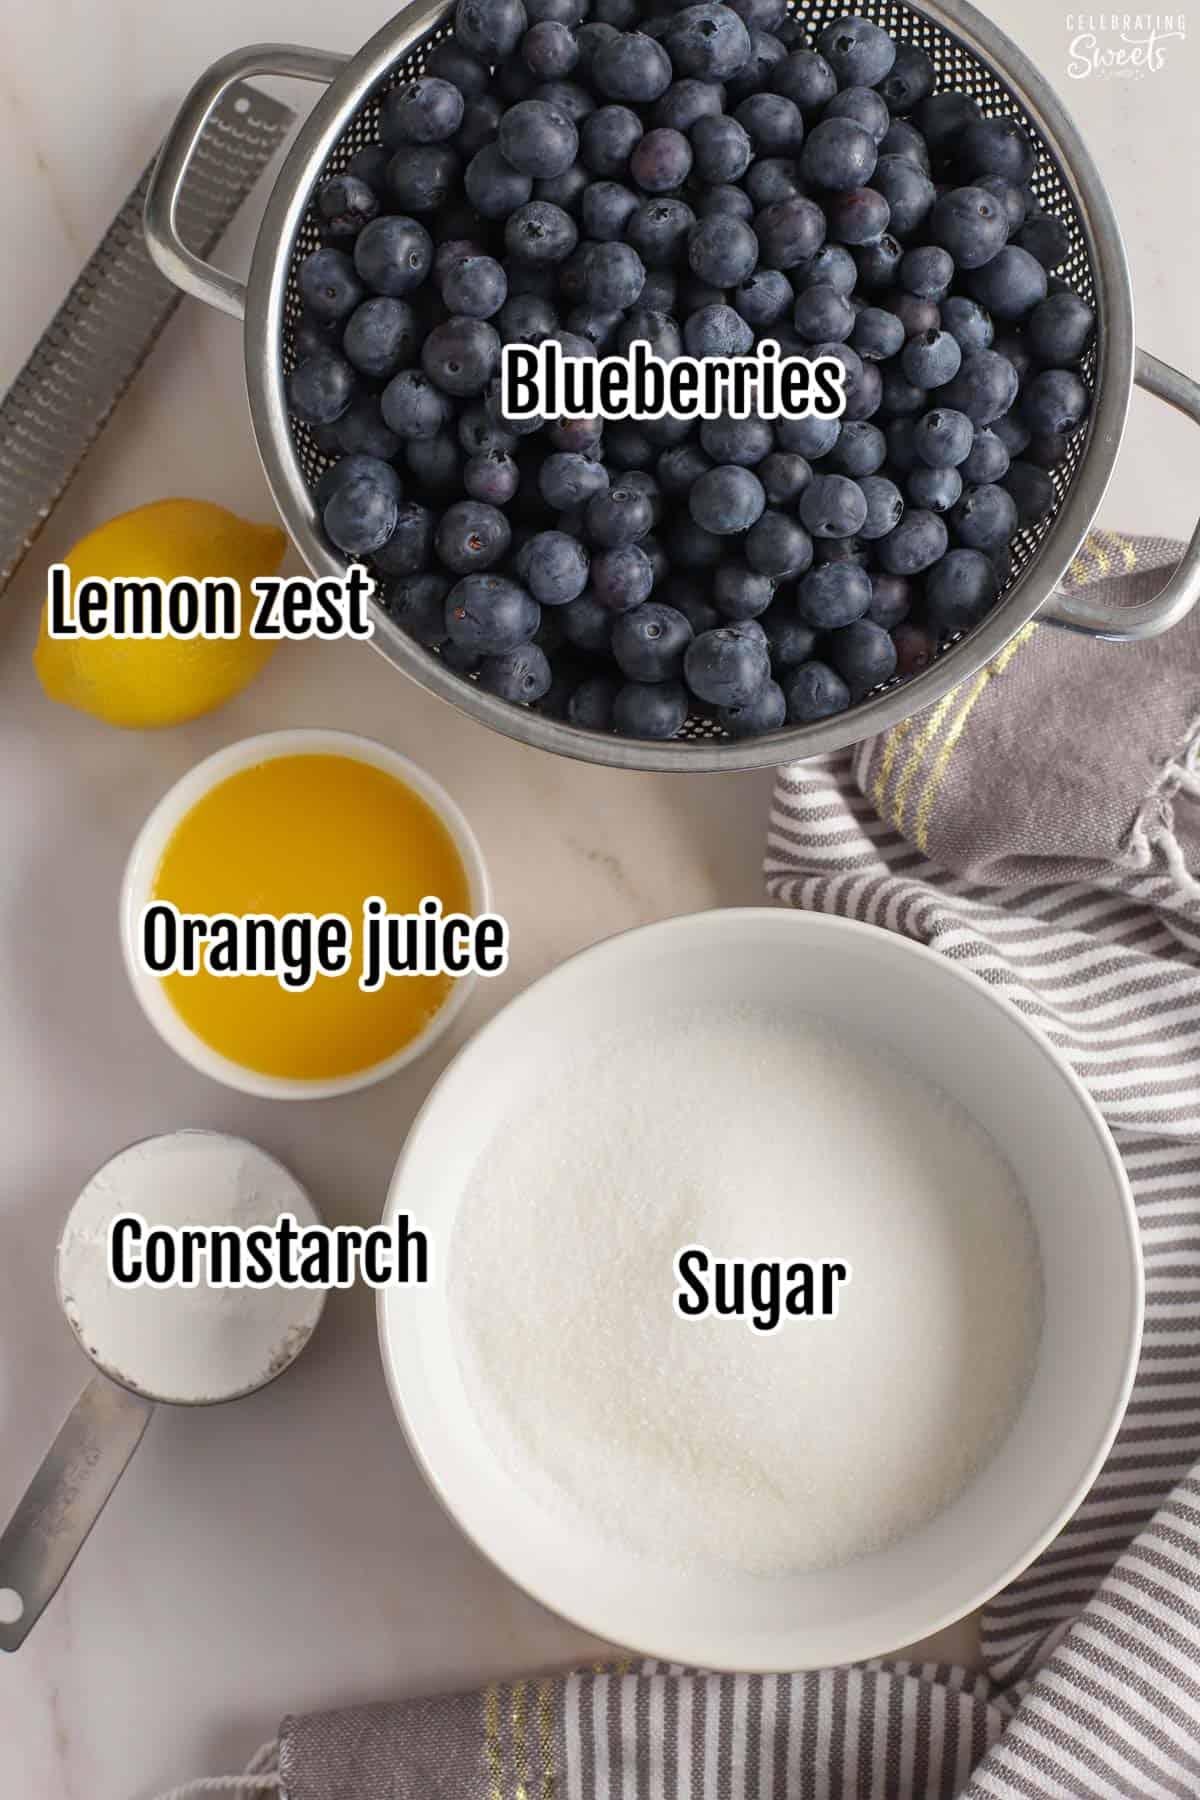 Ingredients for blueberry pie filling: blueberries, cornstarch, juice, sugar, lemon.